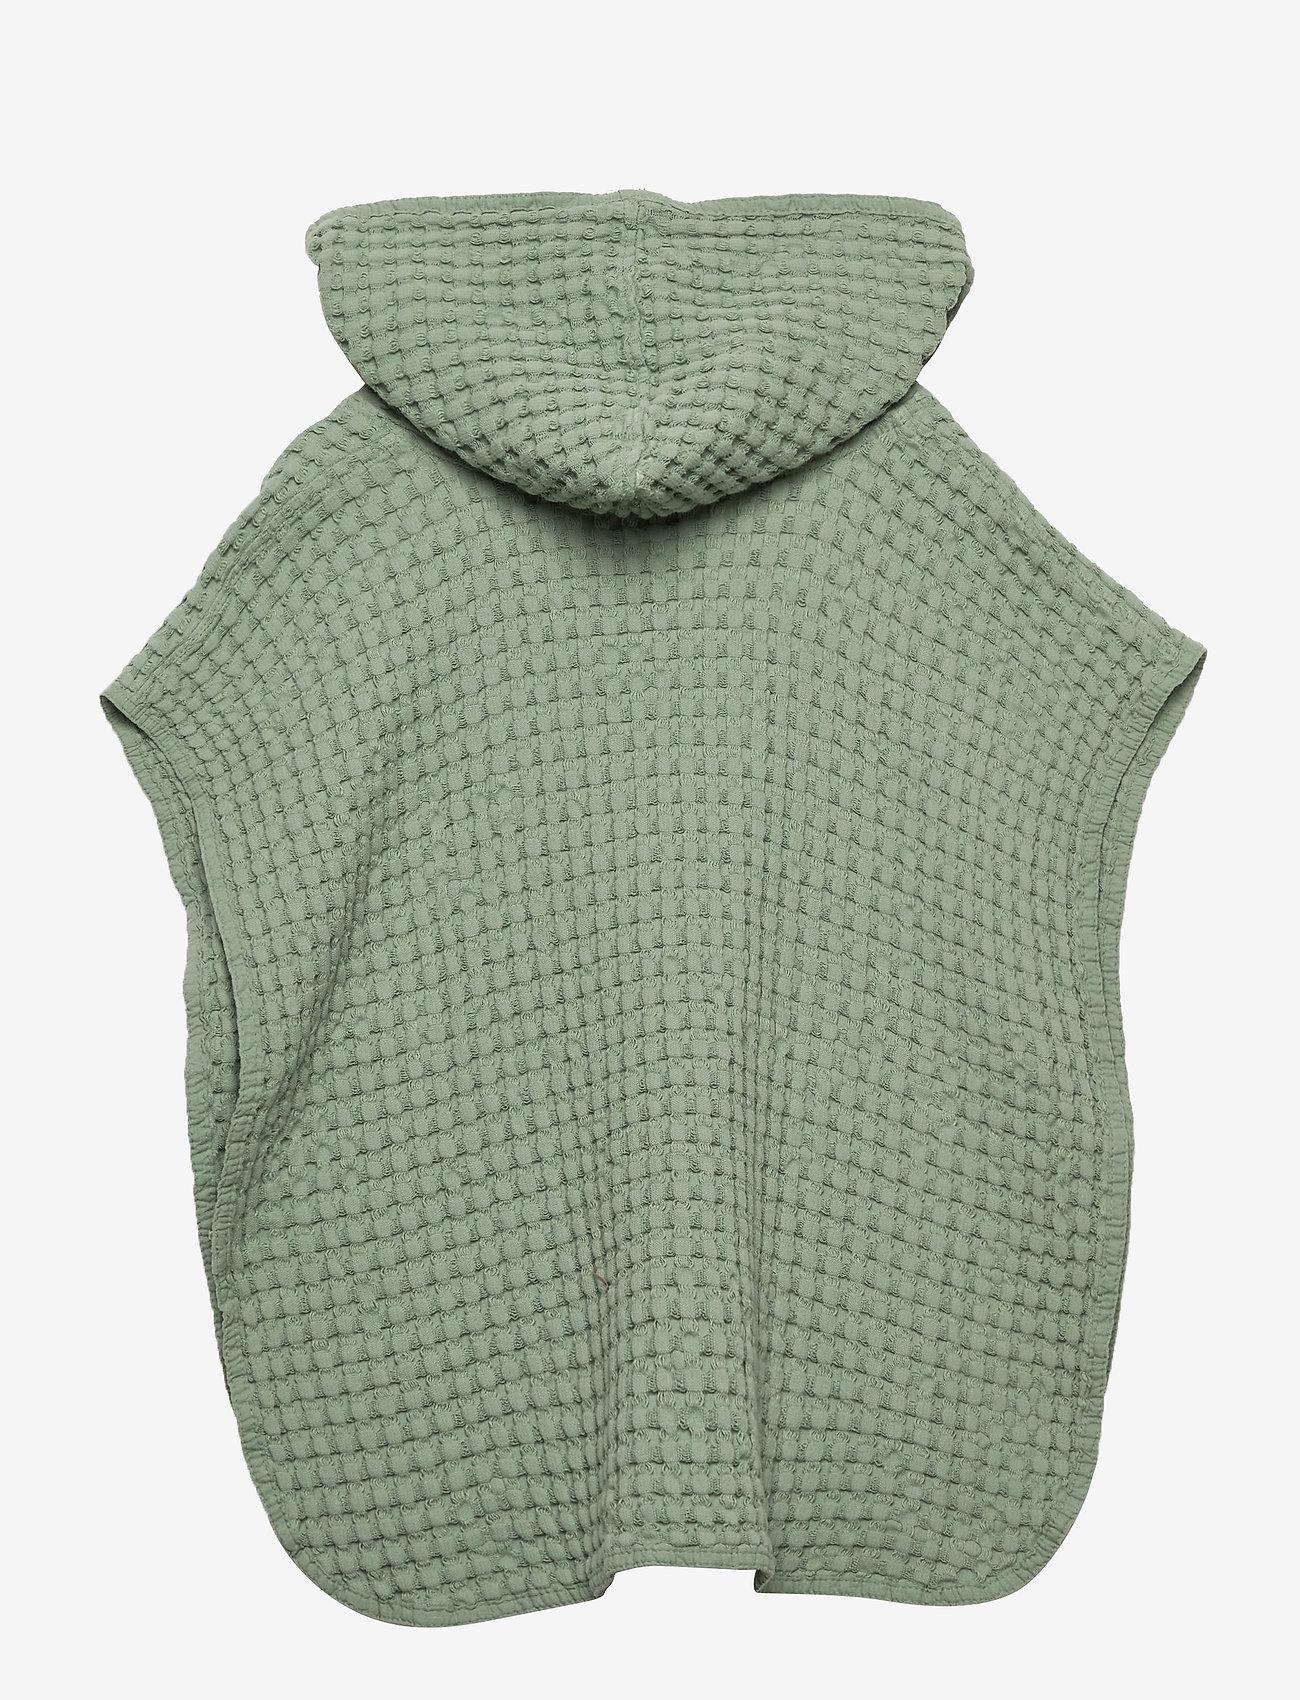 Cozy by Dozy - Cozy by Dozy Poncho - bathrobes - green - 1